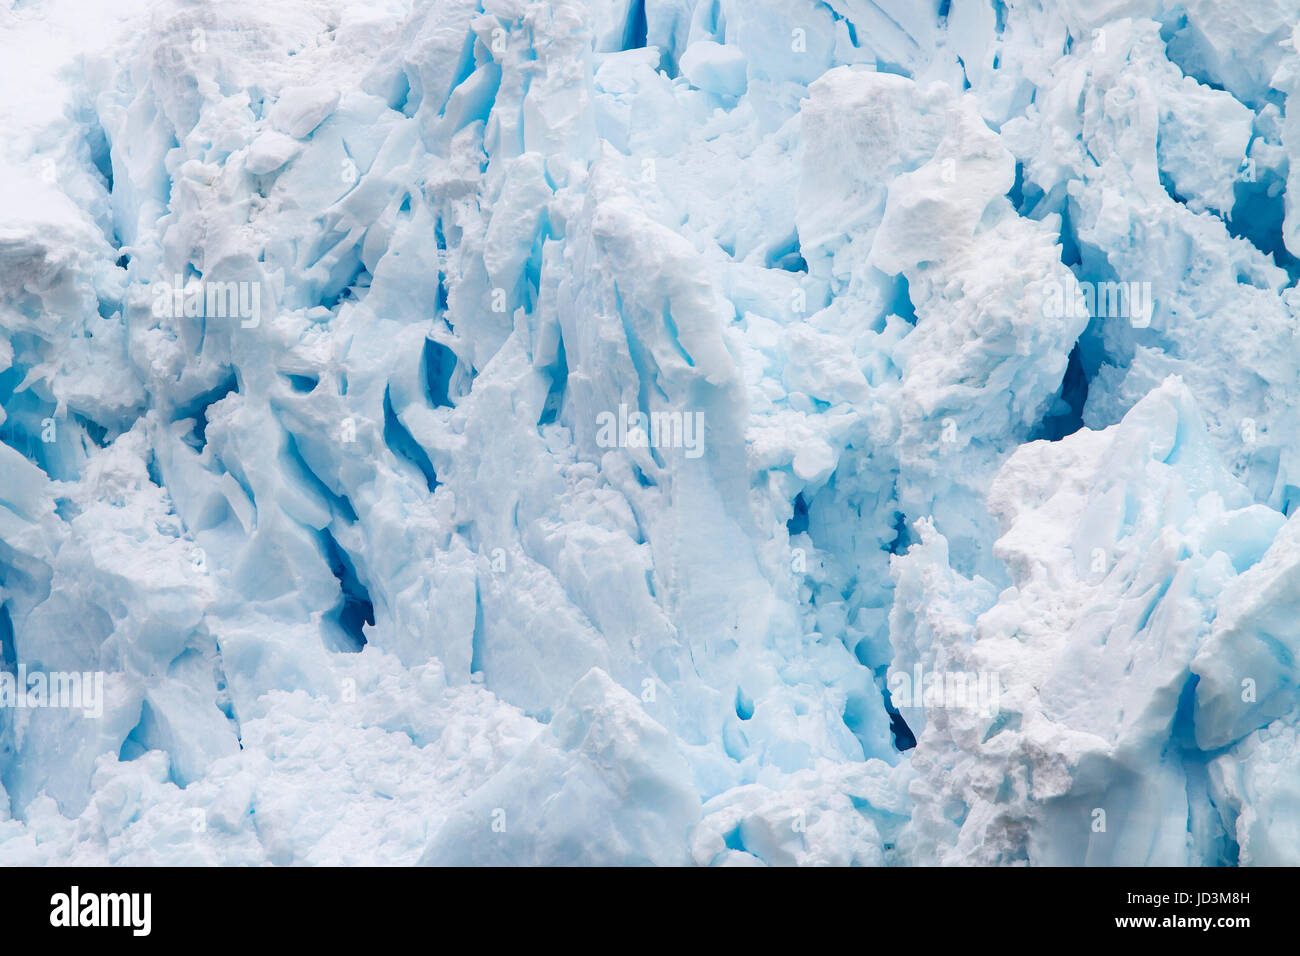 La Antártida paisaje con hielo azul Iceberg, Iceberg, icebergs. Foto de stock